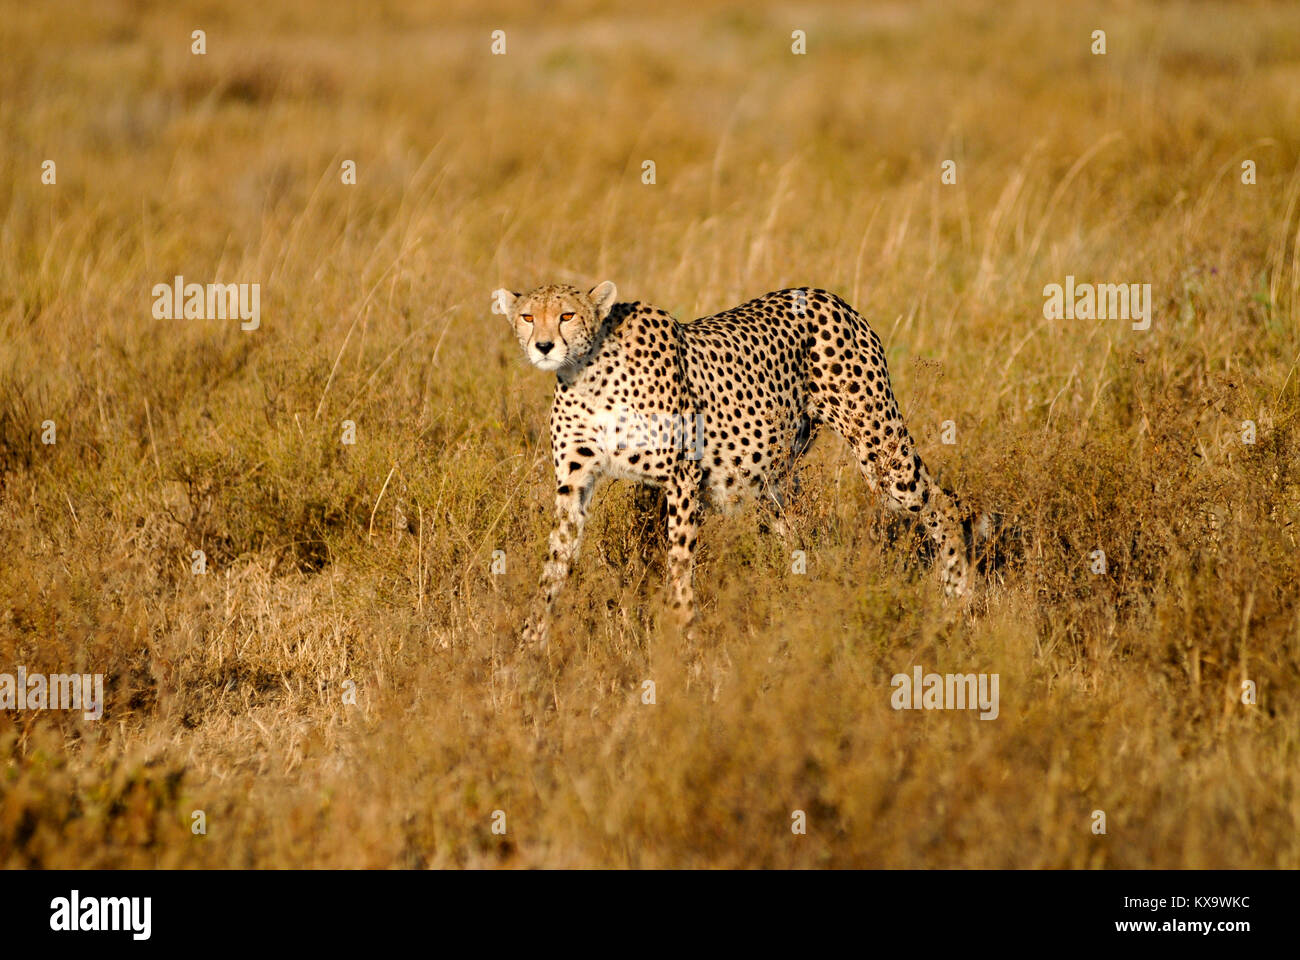 Tansania Serengeti Nationalpark in der Nähe von Arusha, Cheetah/Tansania Serengeti Nationalpark bei Arusha, Stockbild